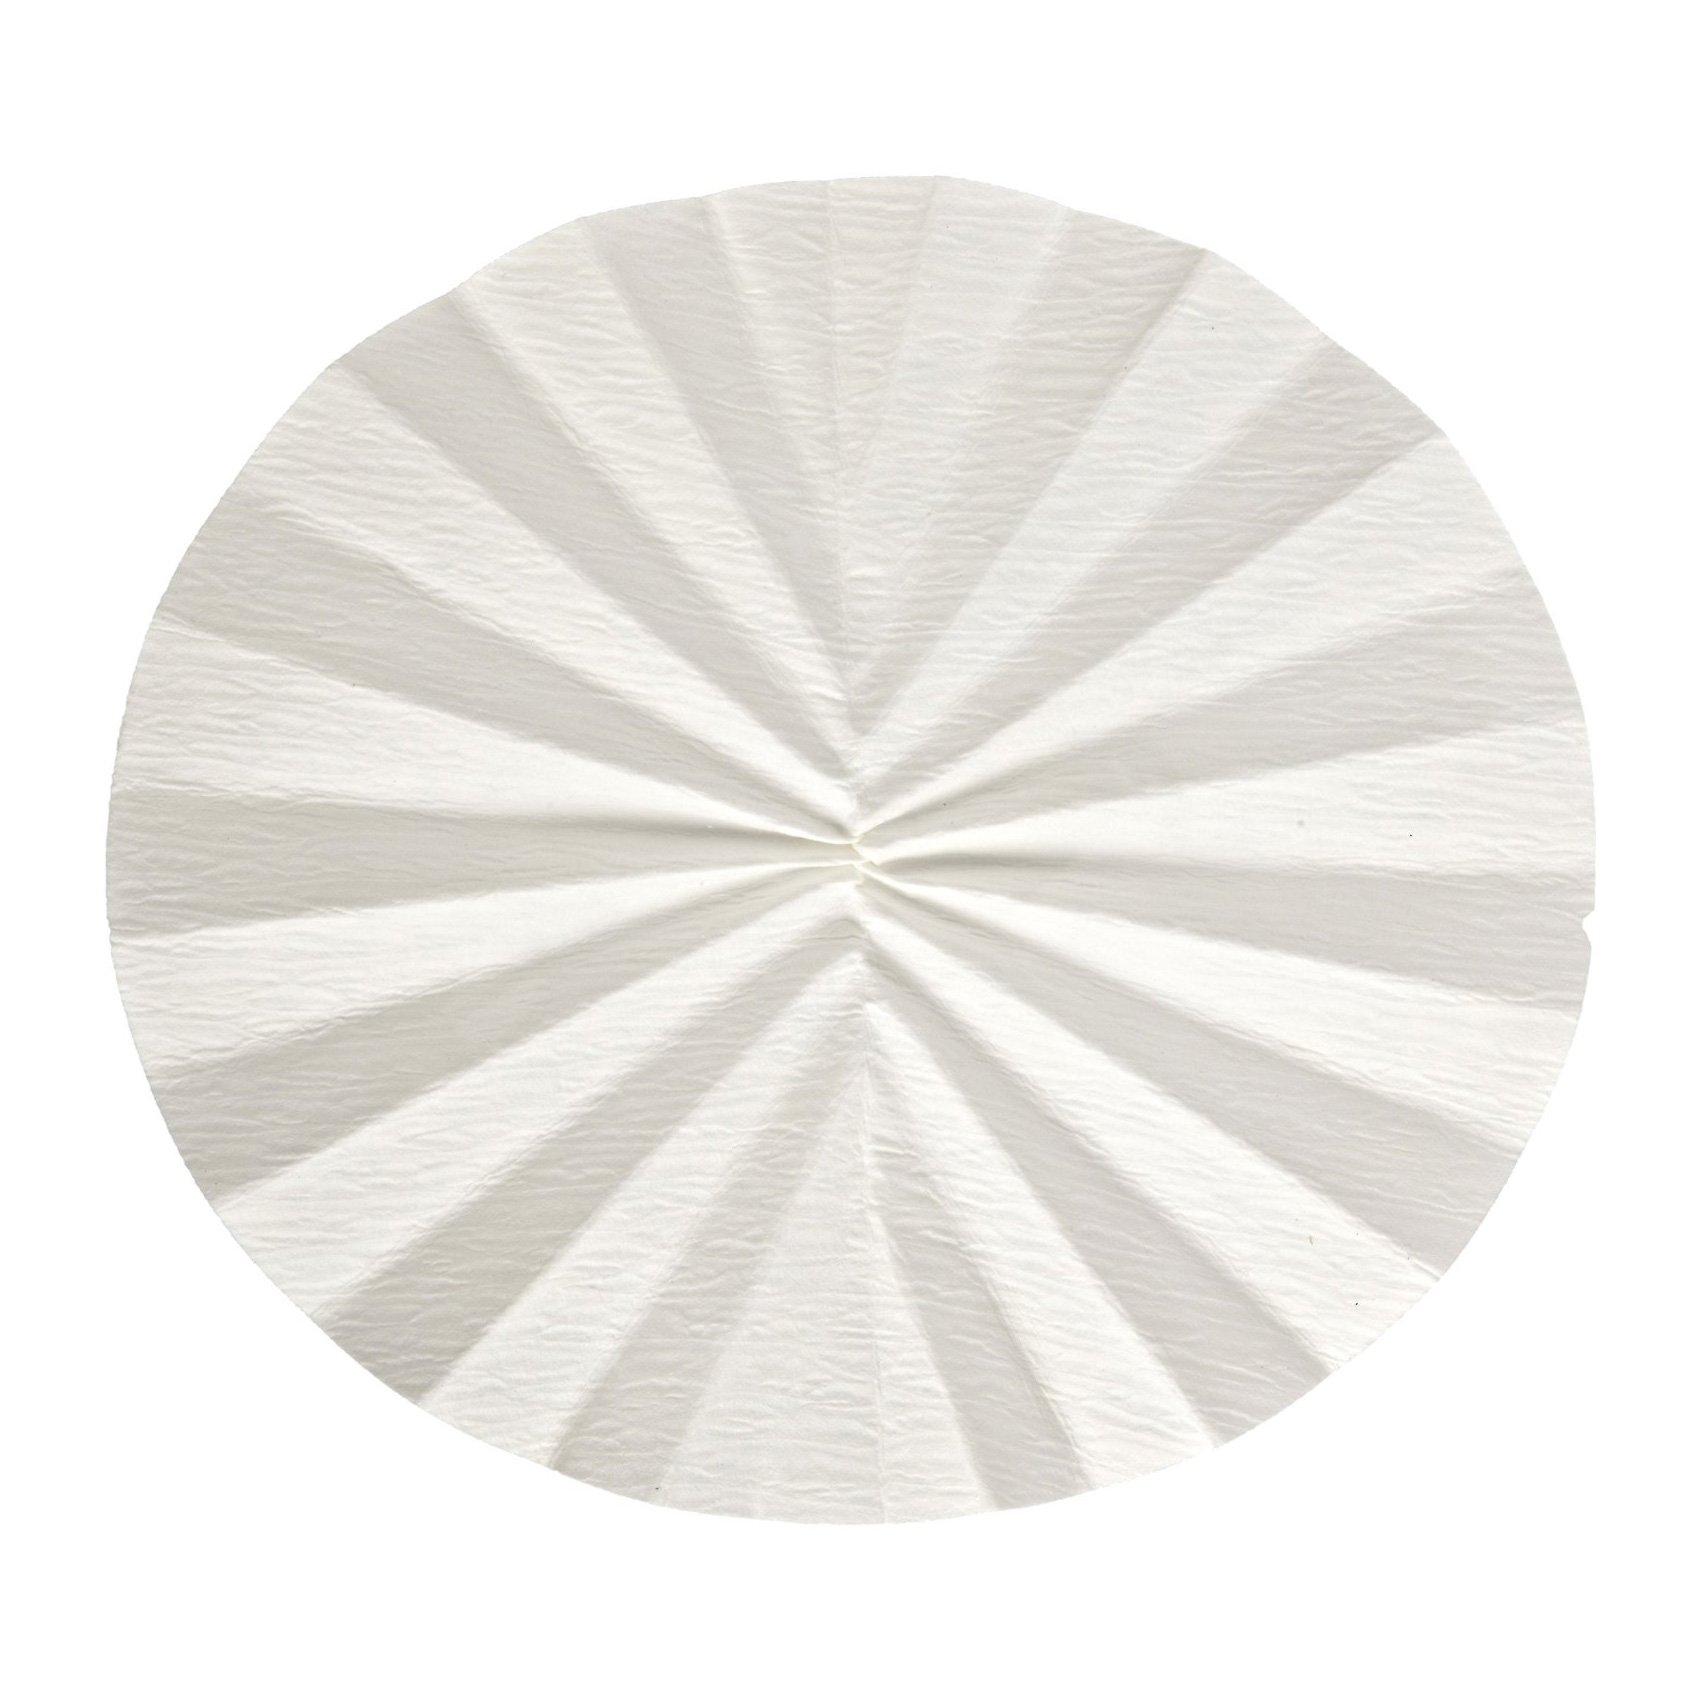 Whatman 10311647 Quantitative Folded Filter Paper, 4-7 Micron, Grade 595-1/2, 185mm Diameter (Pack of 100)